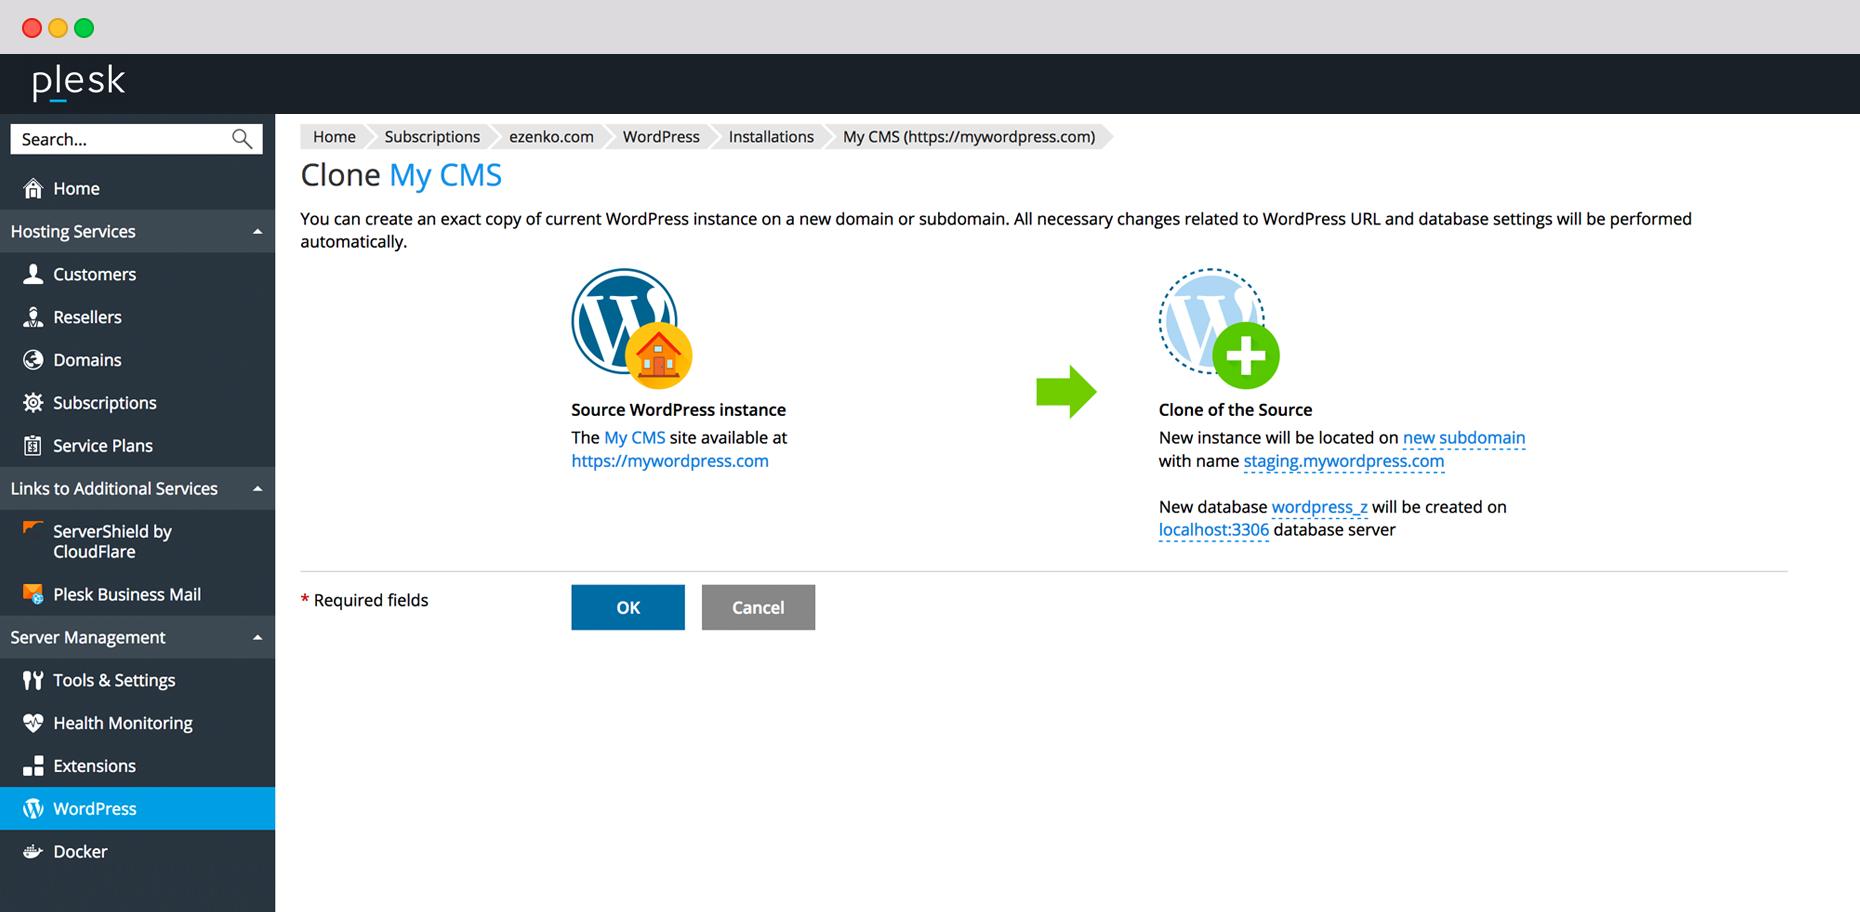 Wordpress Toolkit - Build